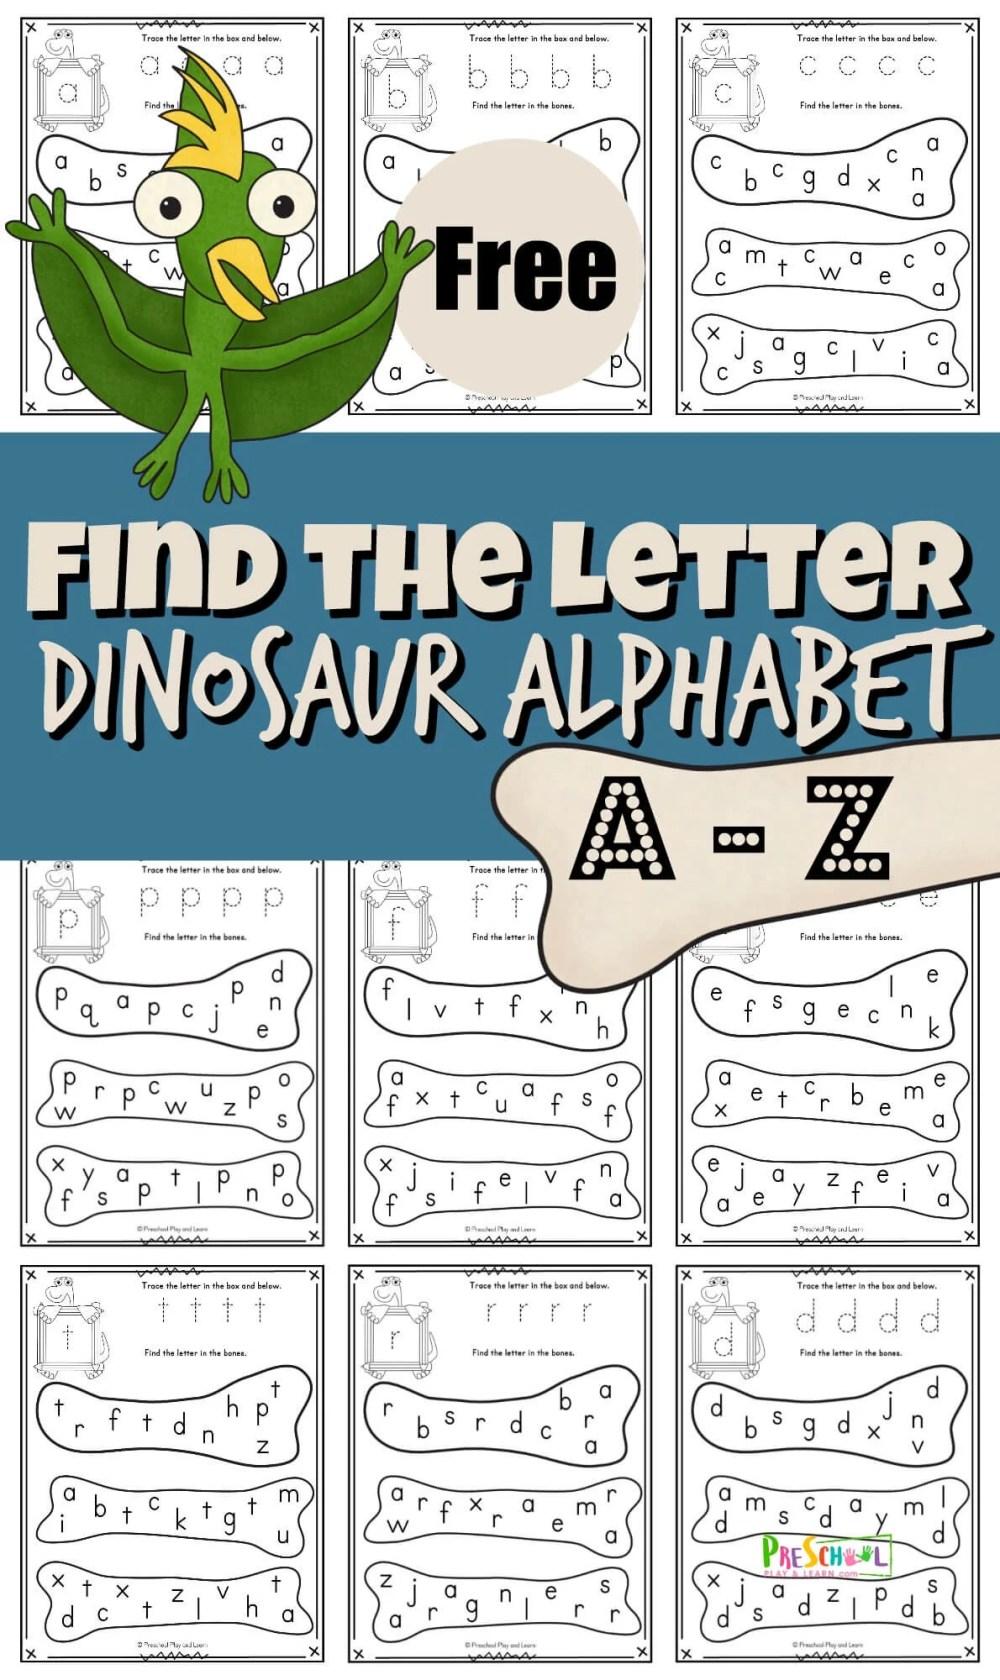 medium resolution of FREE Find the Letter Dinosaur Alphabet Fun